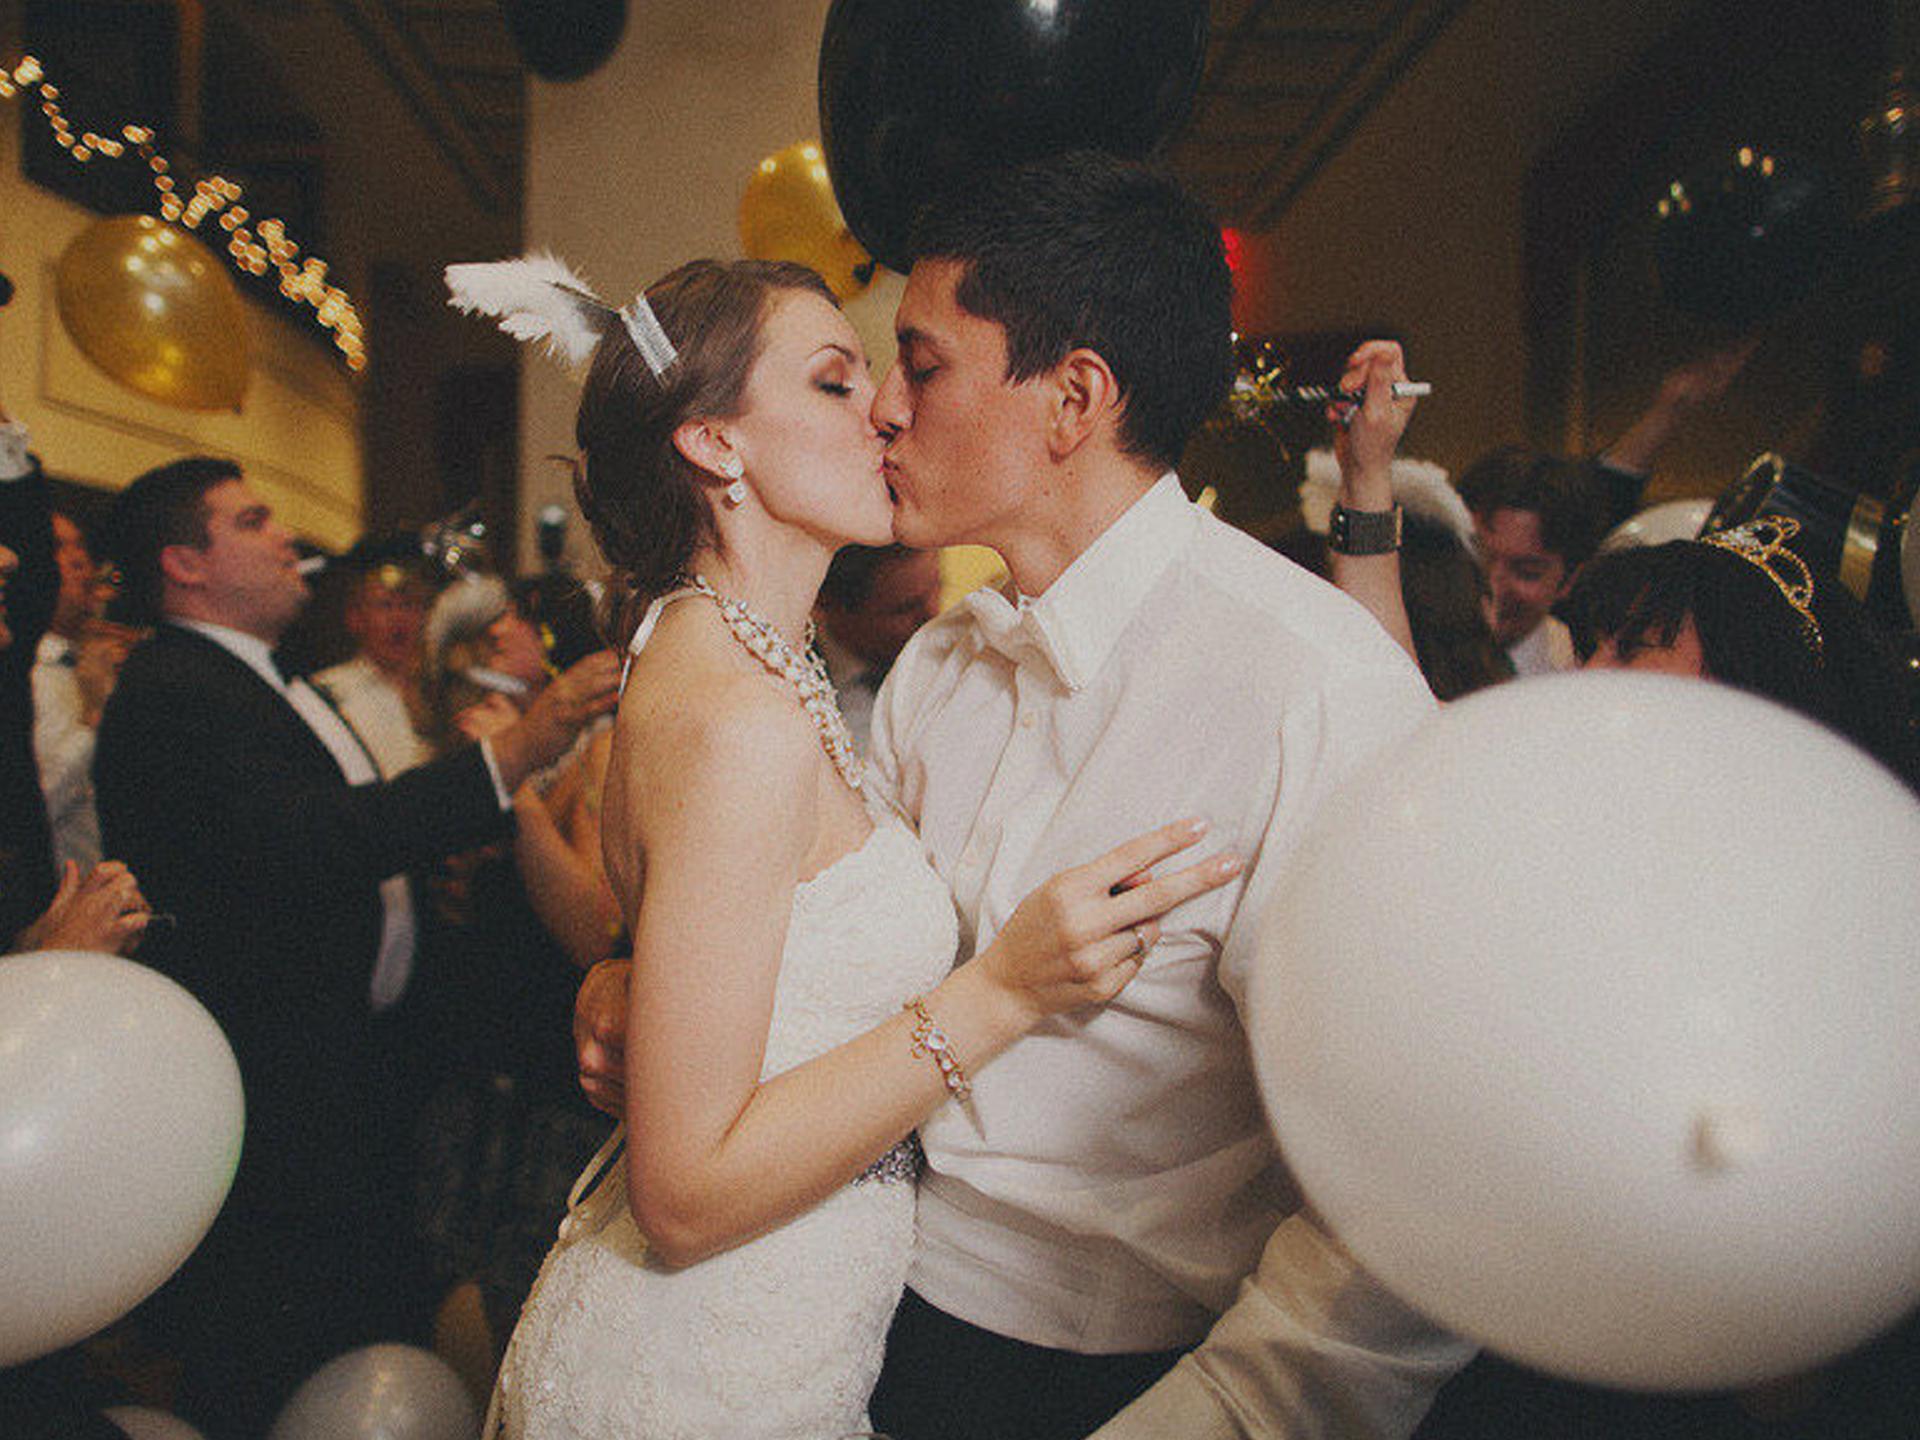 Image of Chris and Melissa's Wedding